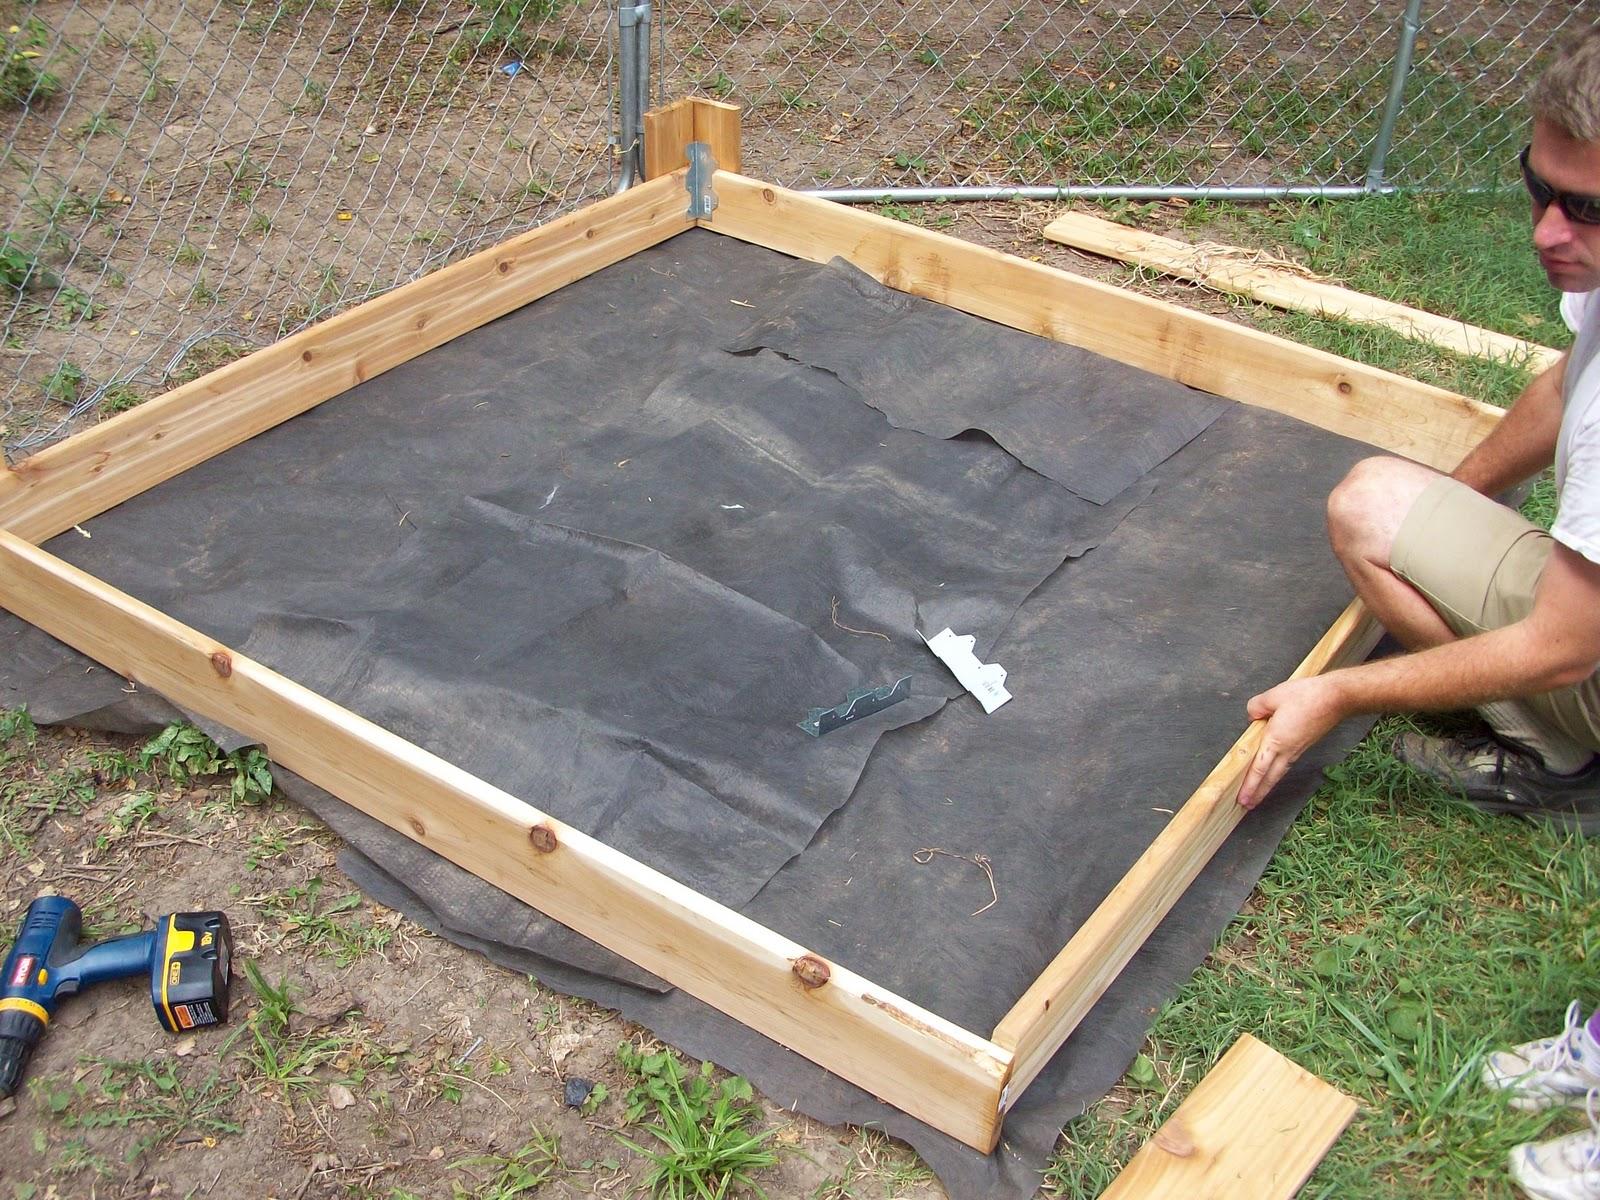 Landscape Fabric Under Deck : Homestead roots sandbox for addies birthday could also